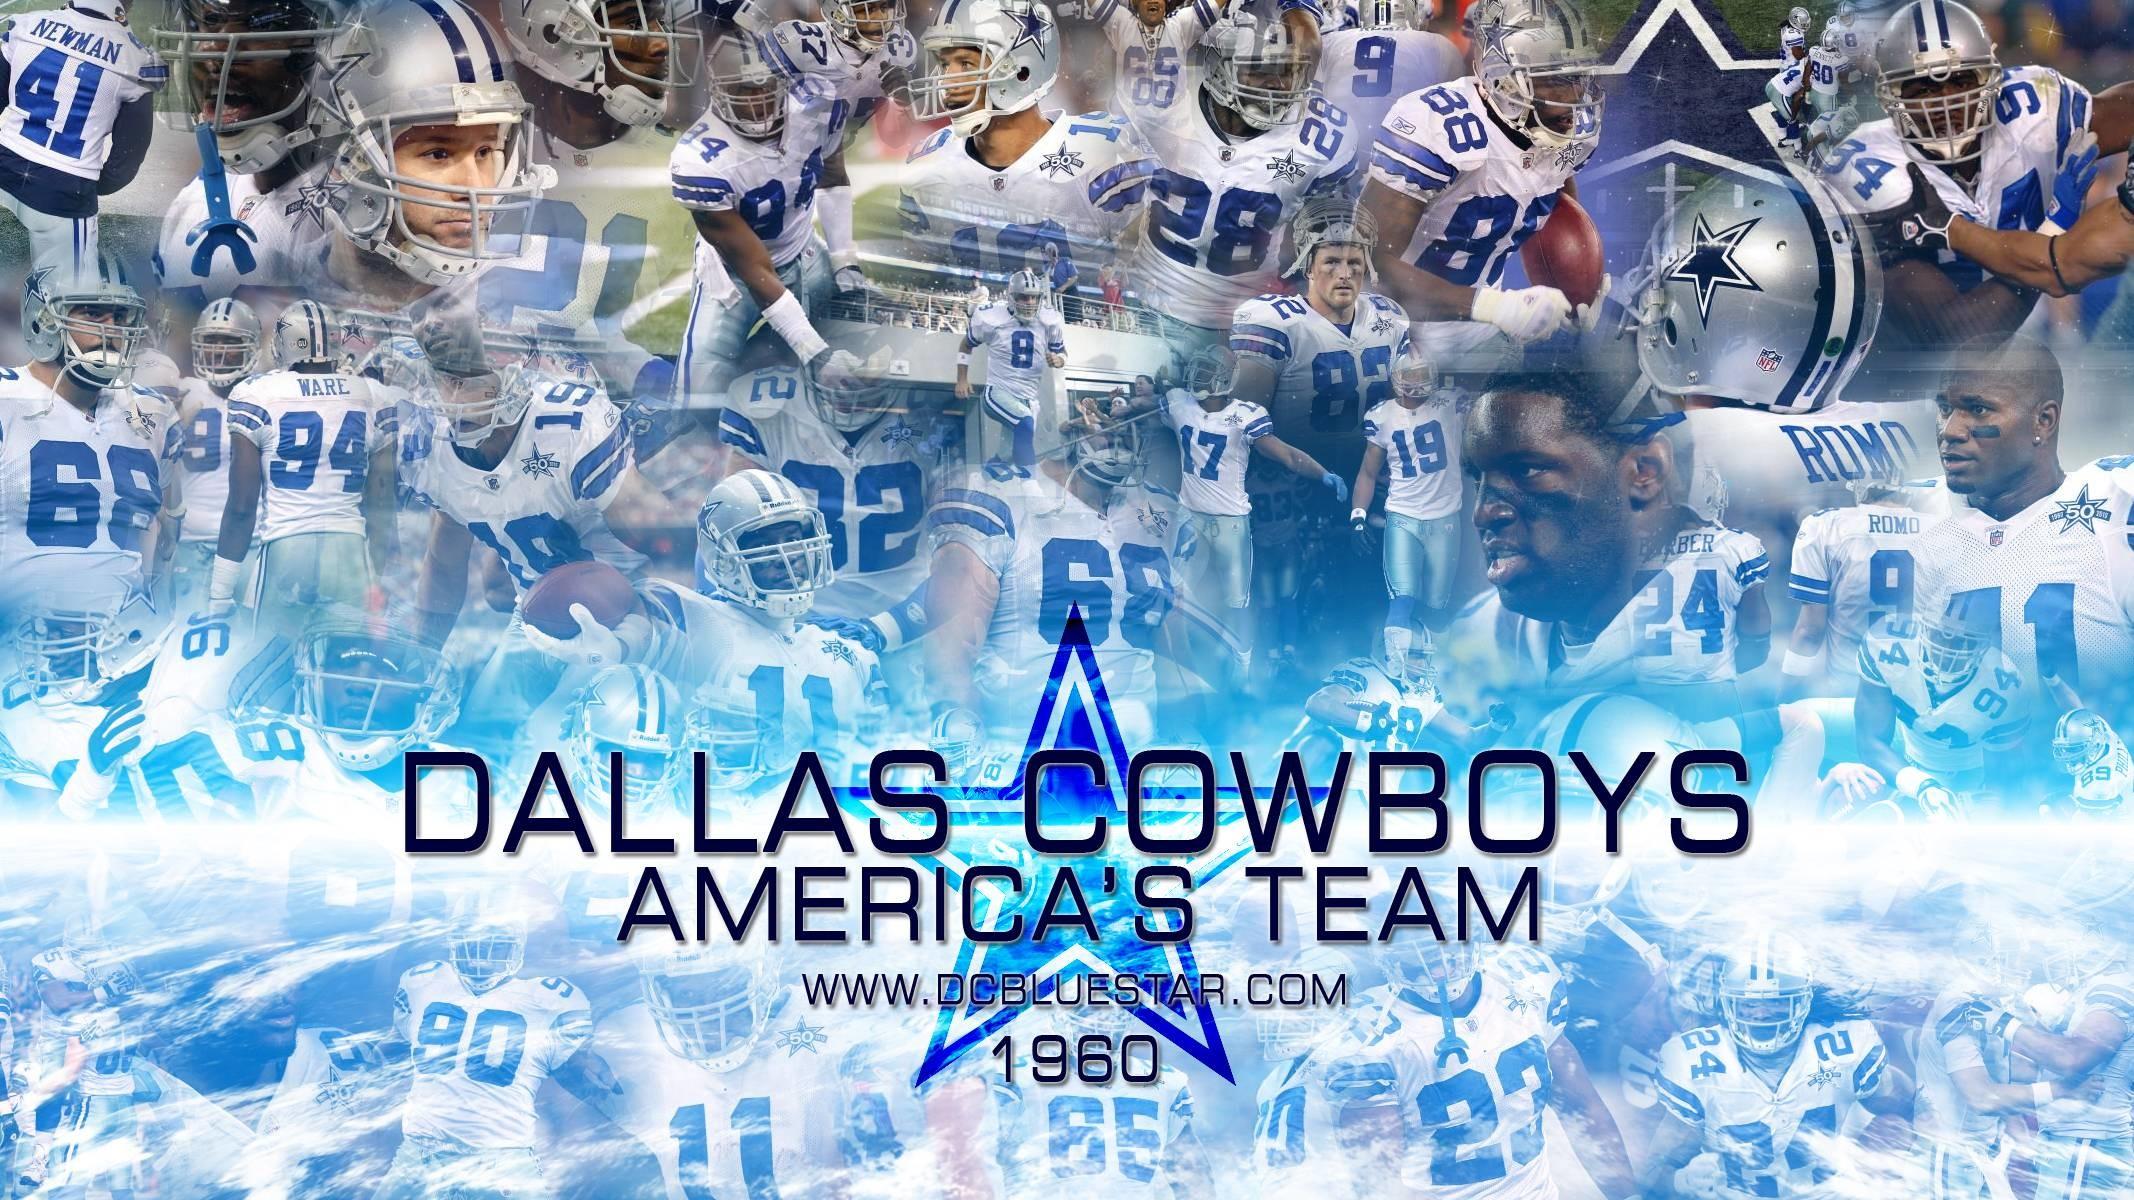 x American Football Dallas Cowboys Trophy Super Bowl | HD Wallpapers |  Pinterest | Dallas cowboys wallpaper, Hd wallpaper and Wallpaper